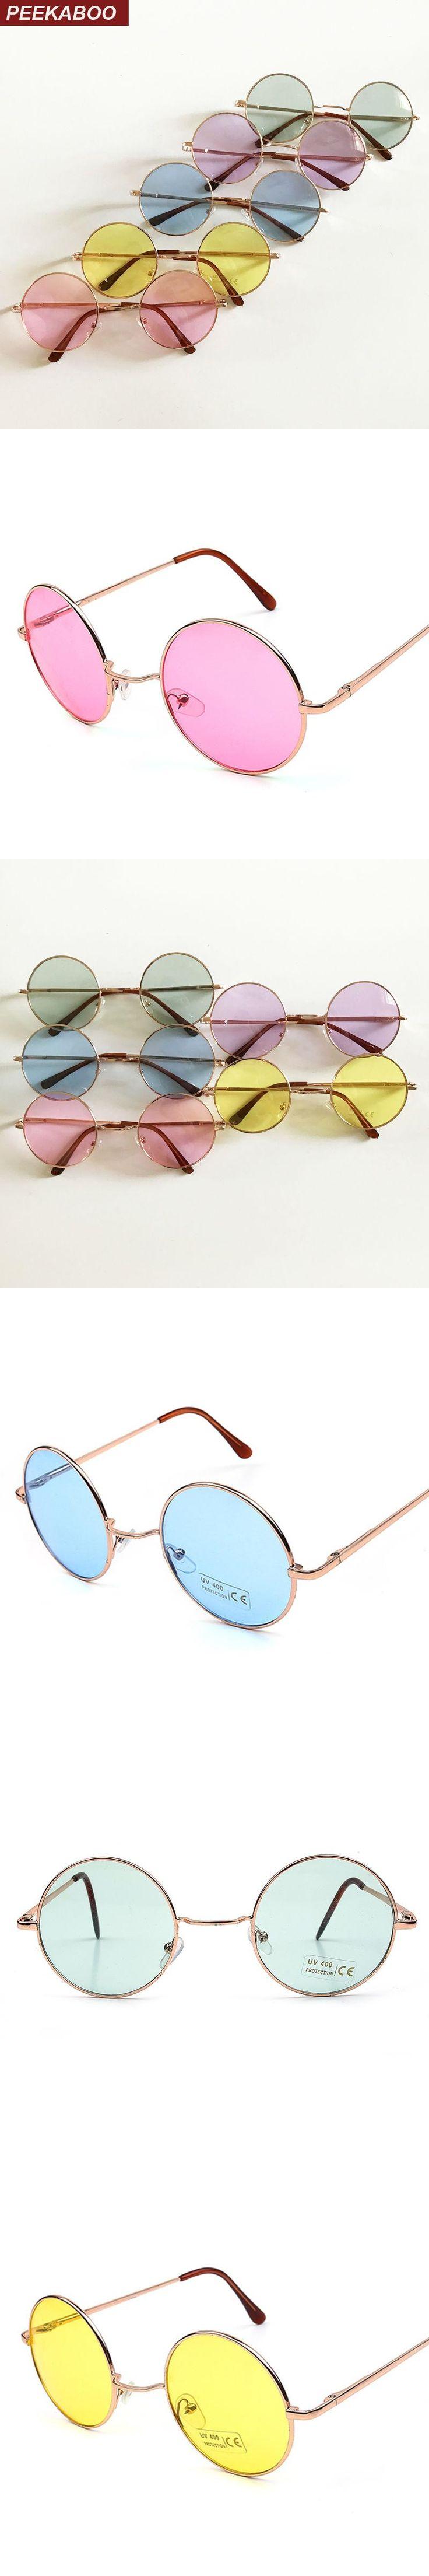 Peekaboo vintage round sunglasses women male cheap sun glasses round men yellow blue green uv400 metal